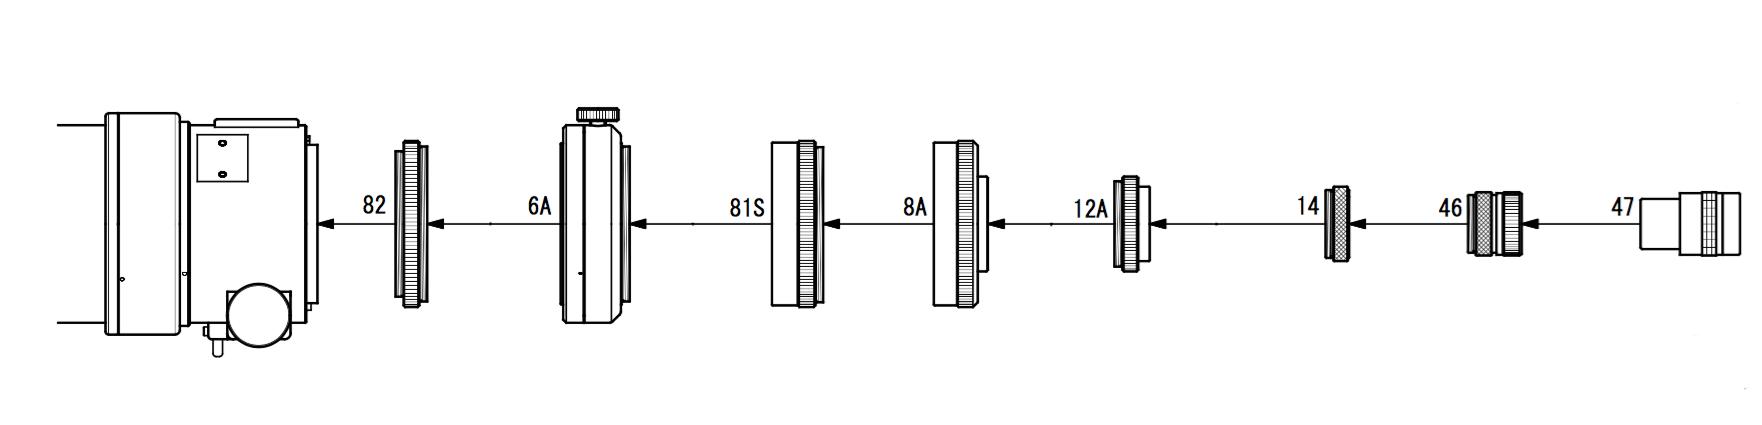 fsq-106edx4-config.png